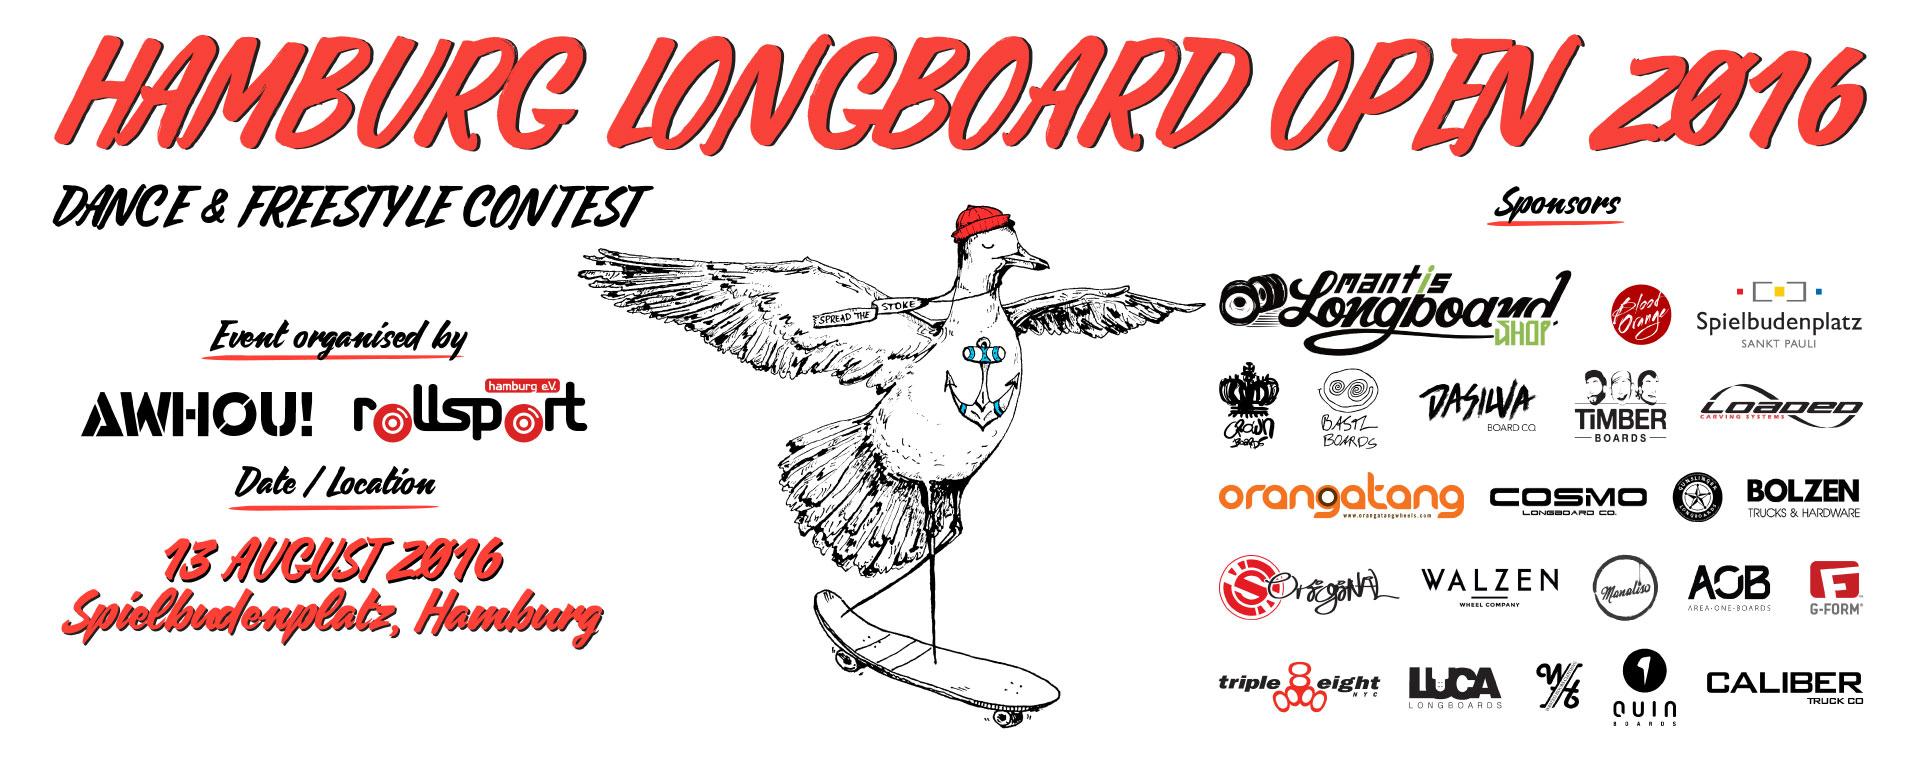 Hamburg Longboard Open 2016